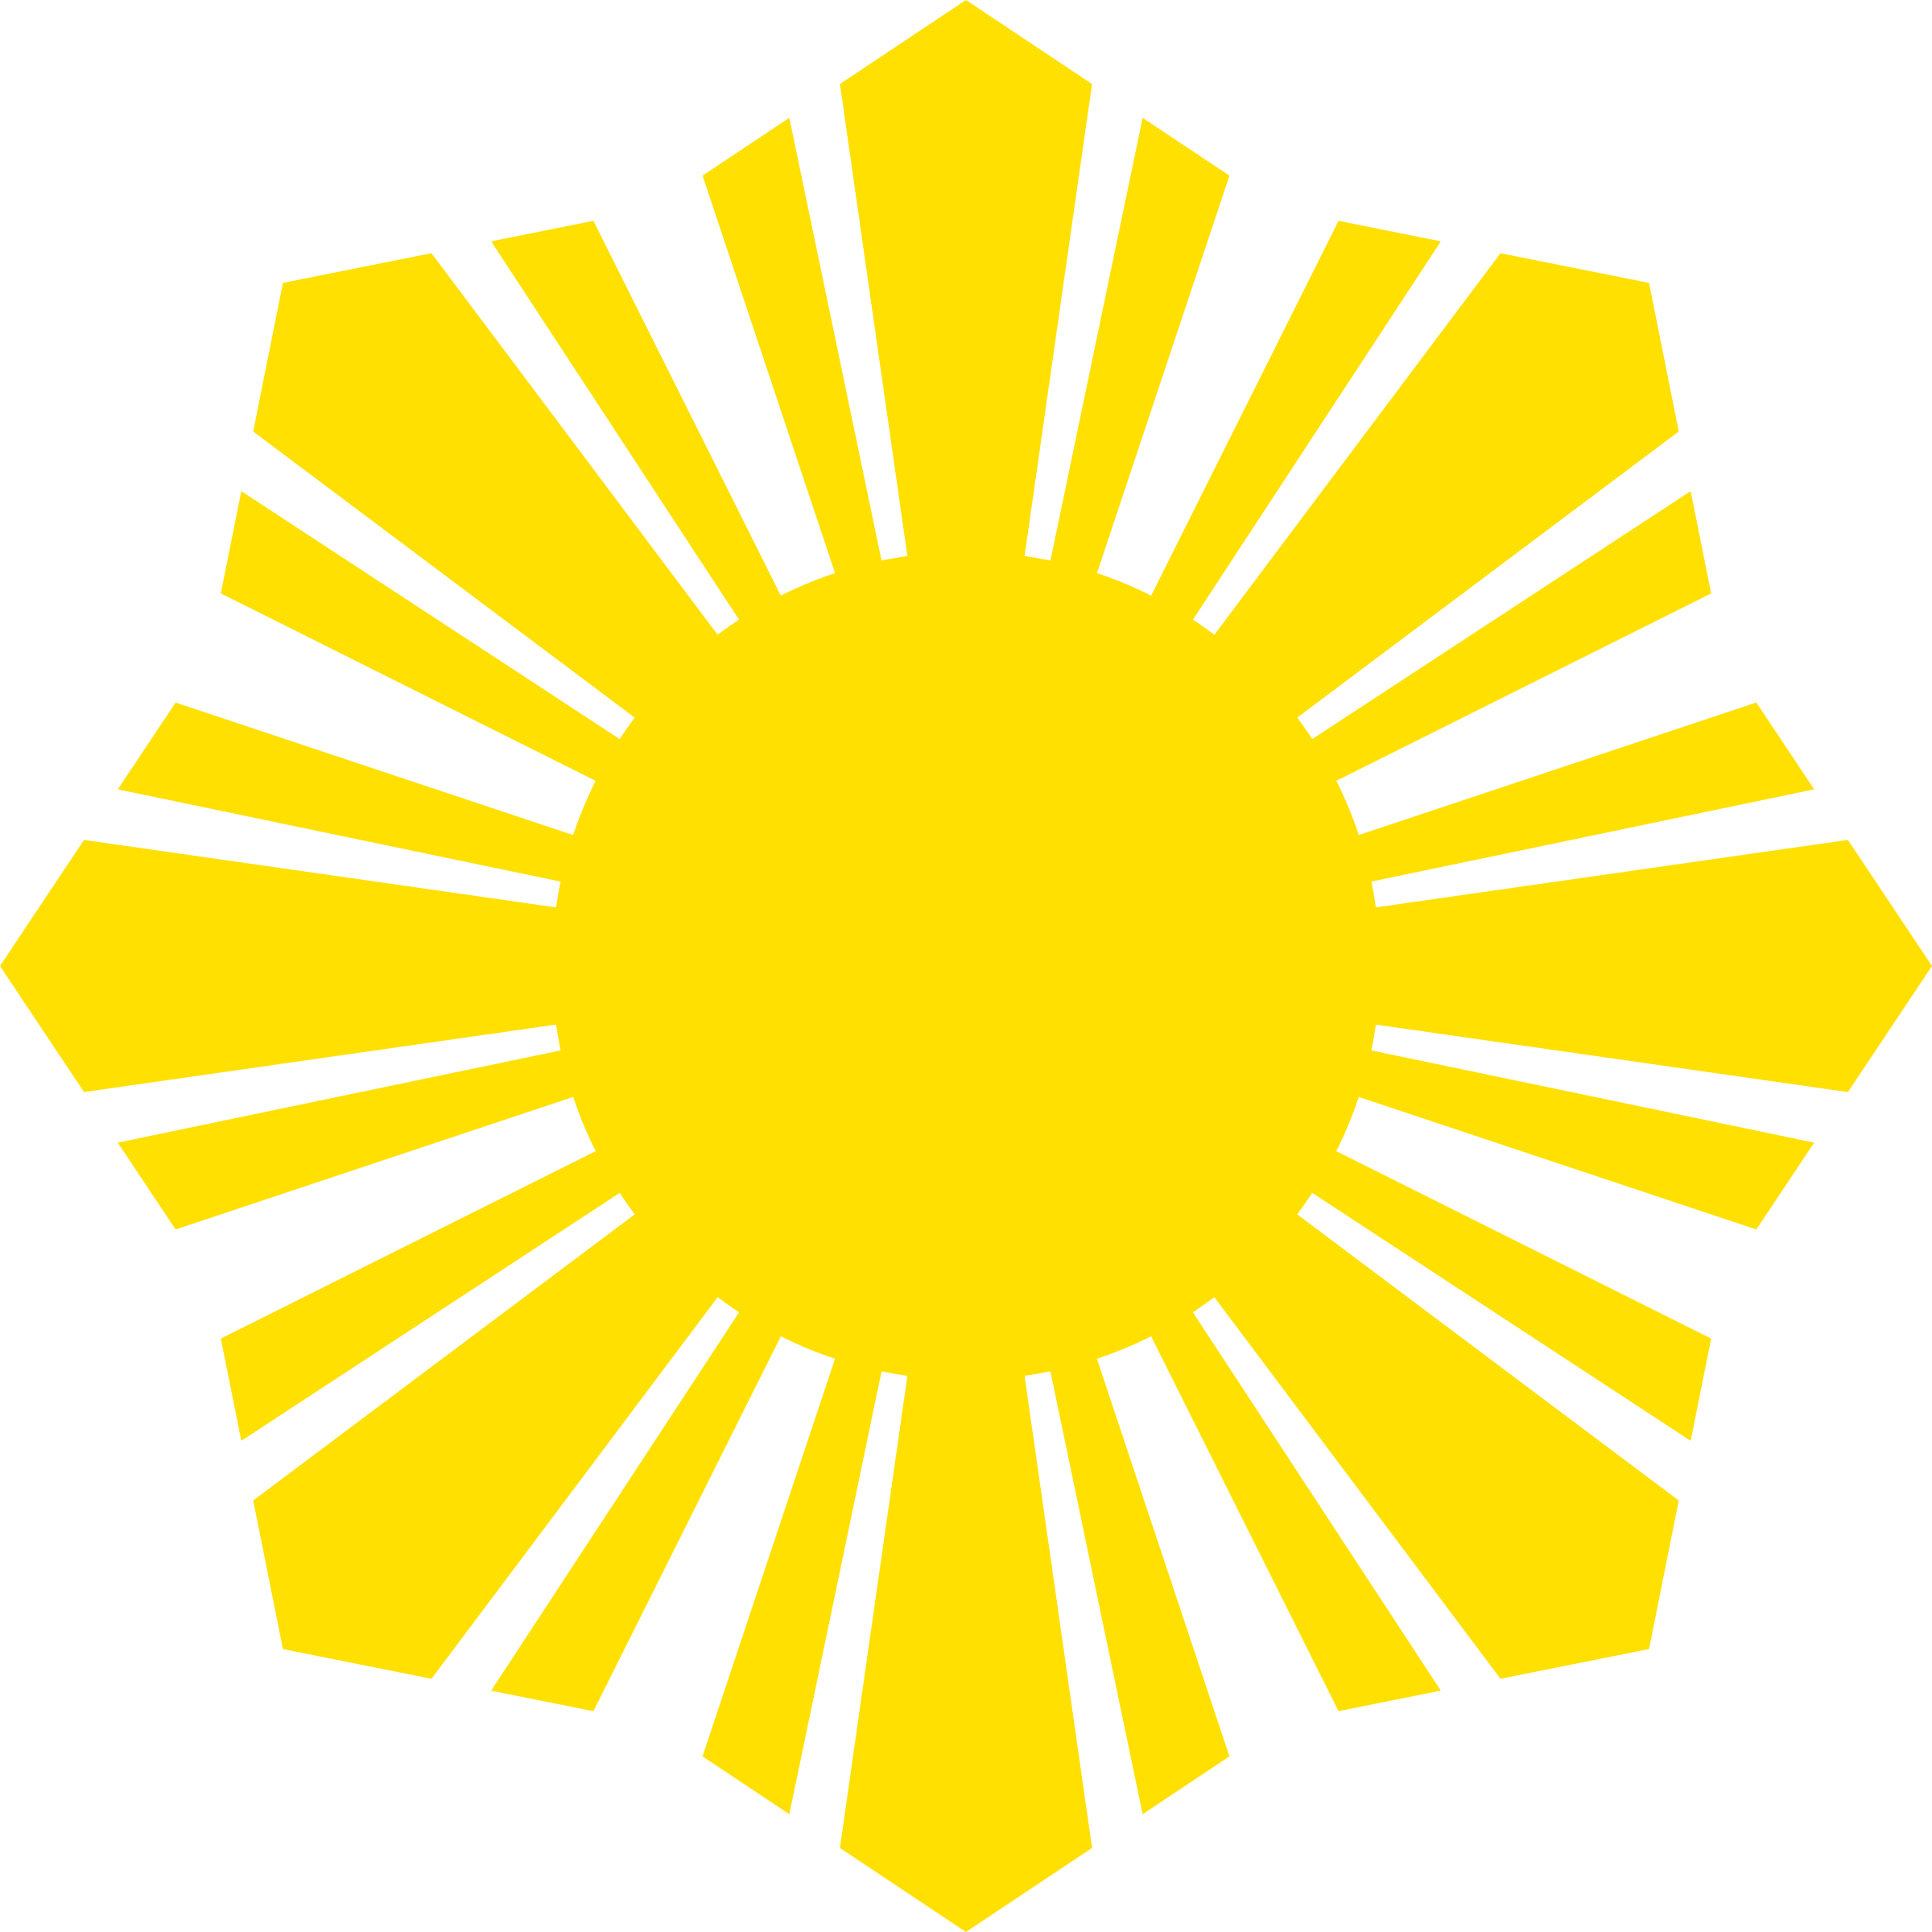 vector sun - photo #30